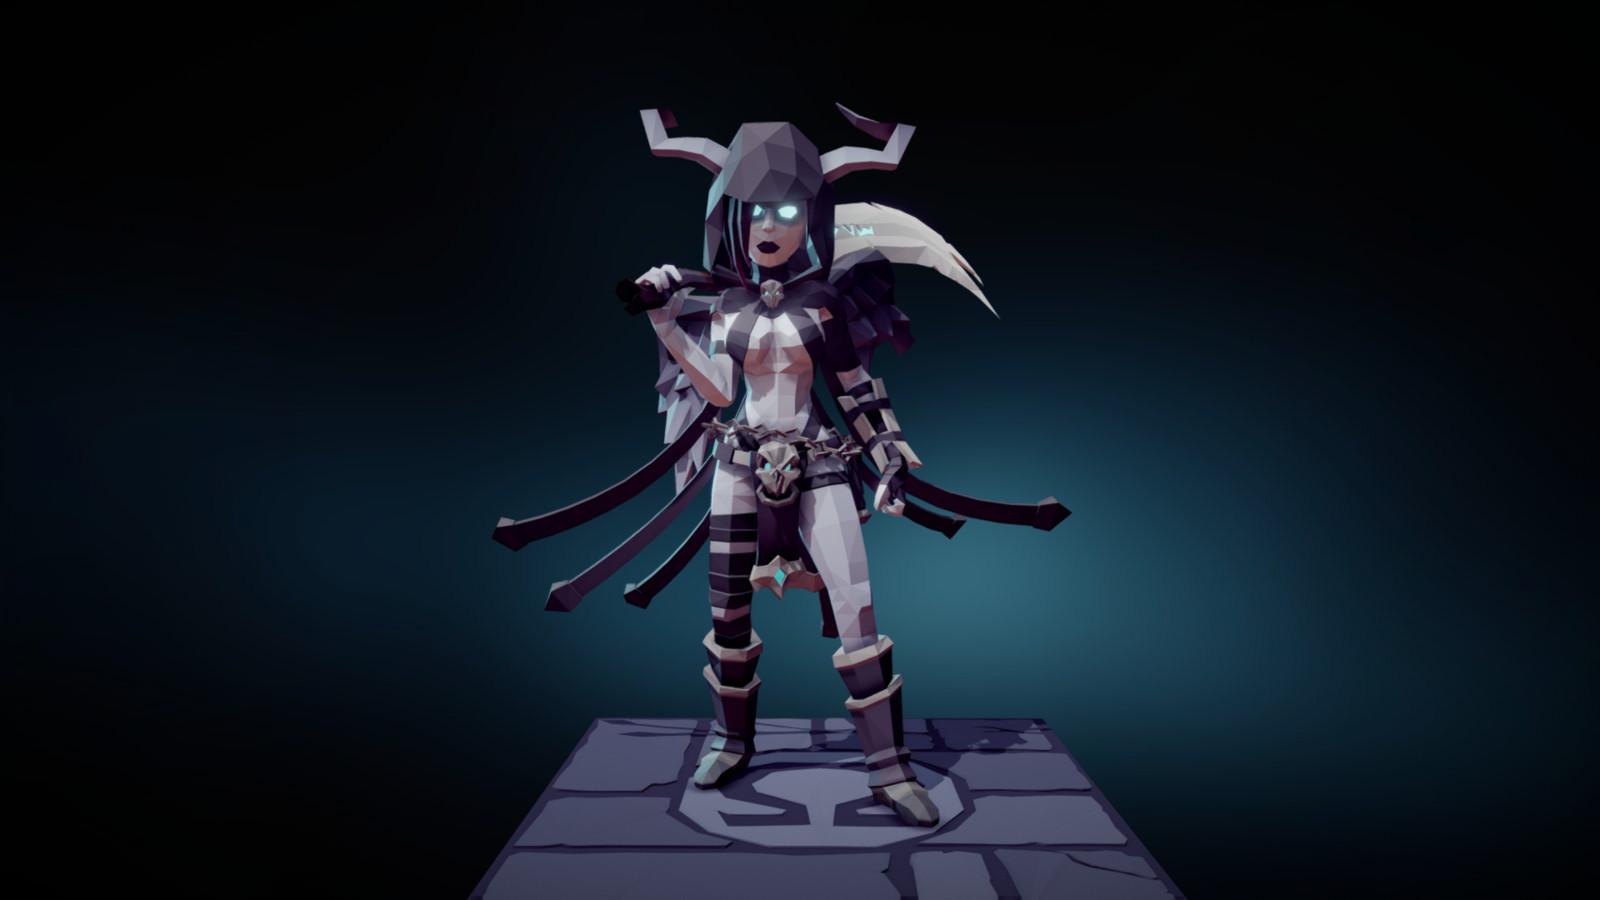 Female Warrior Character